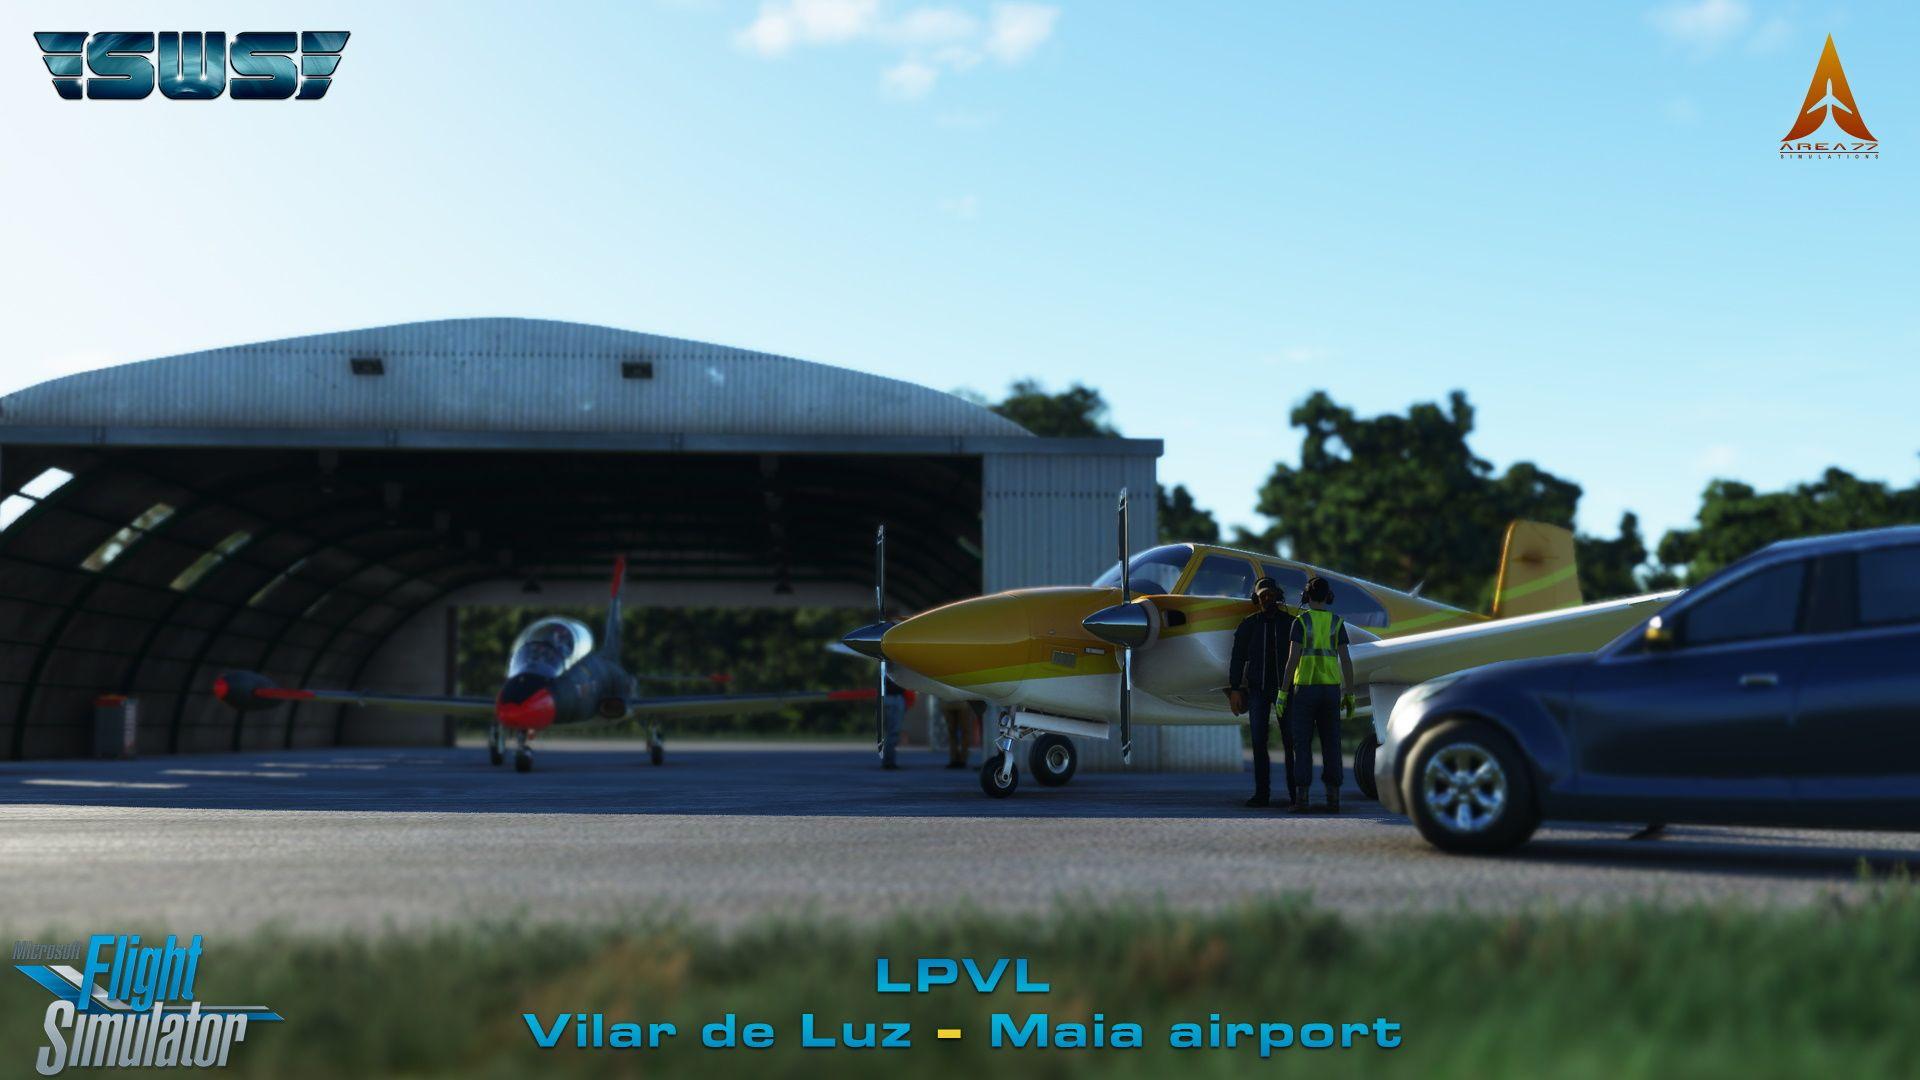 LPVL2.jpg